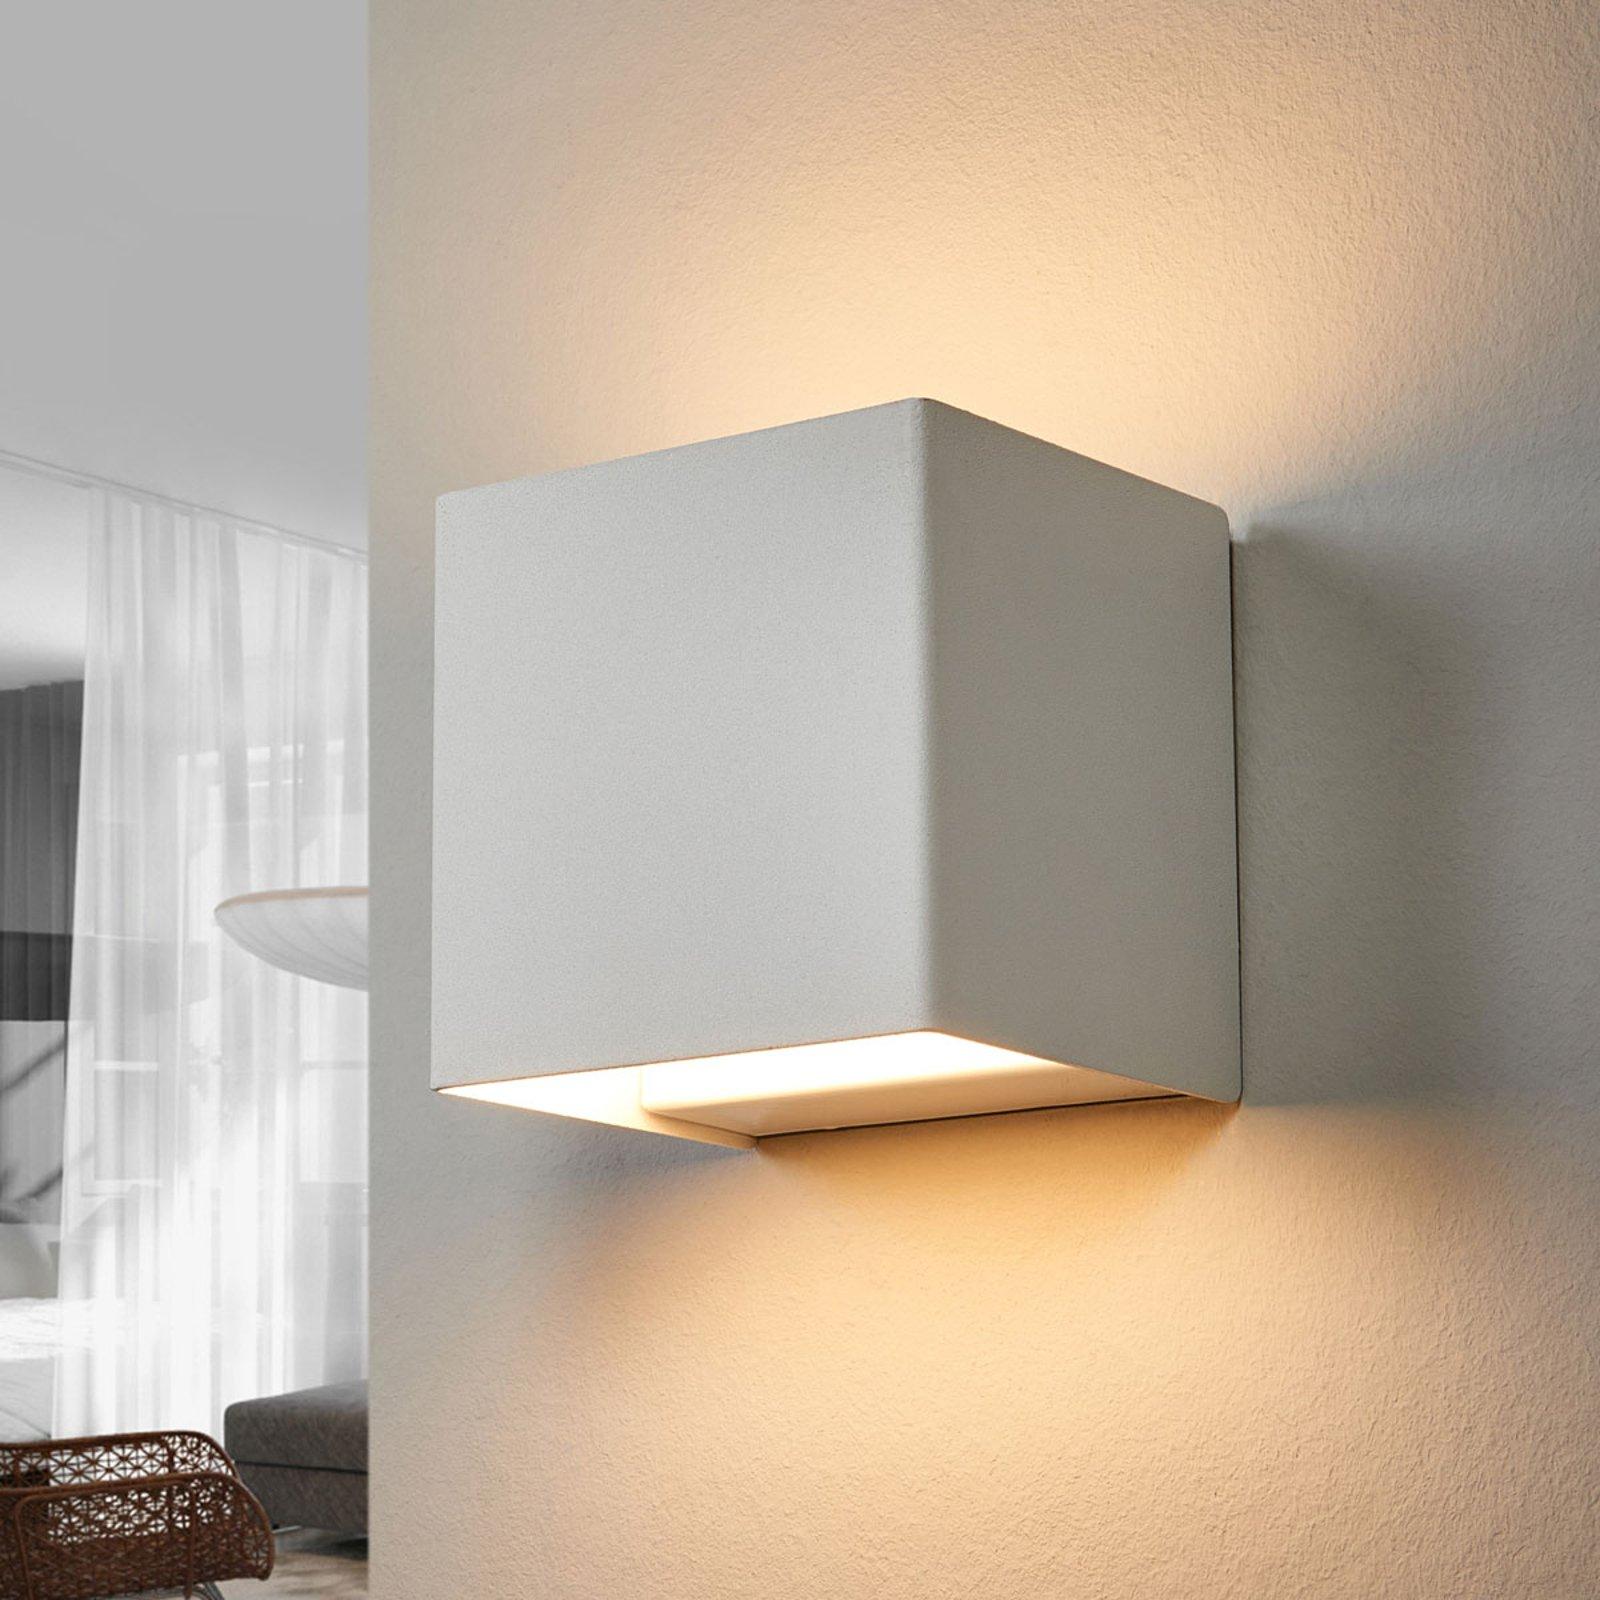 LED-vegglampe Kimberly, 9x9cm, hvit